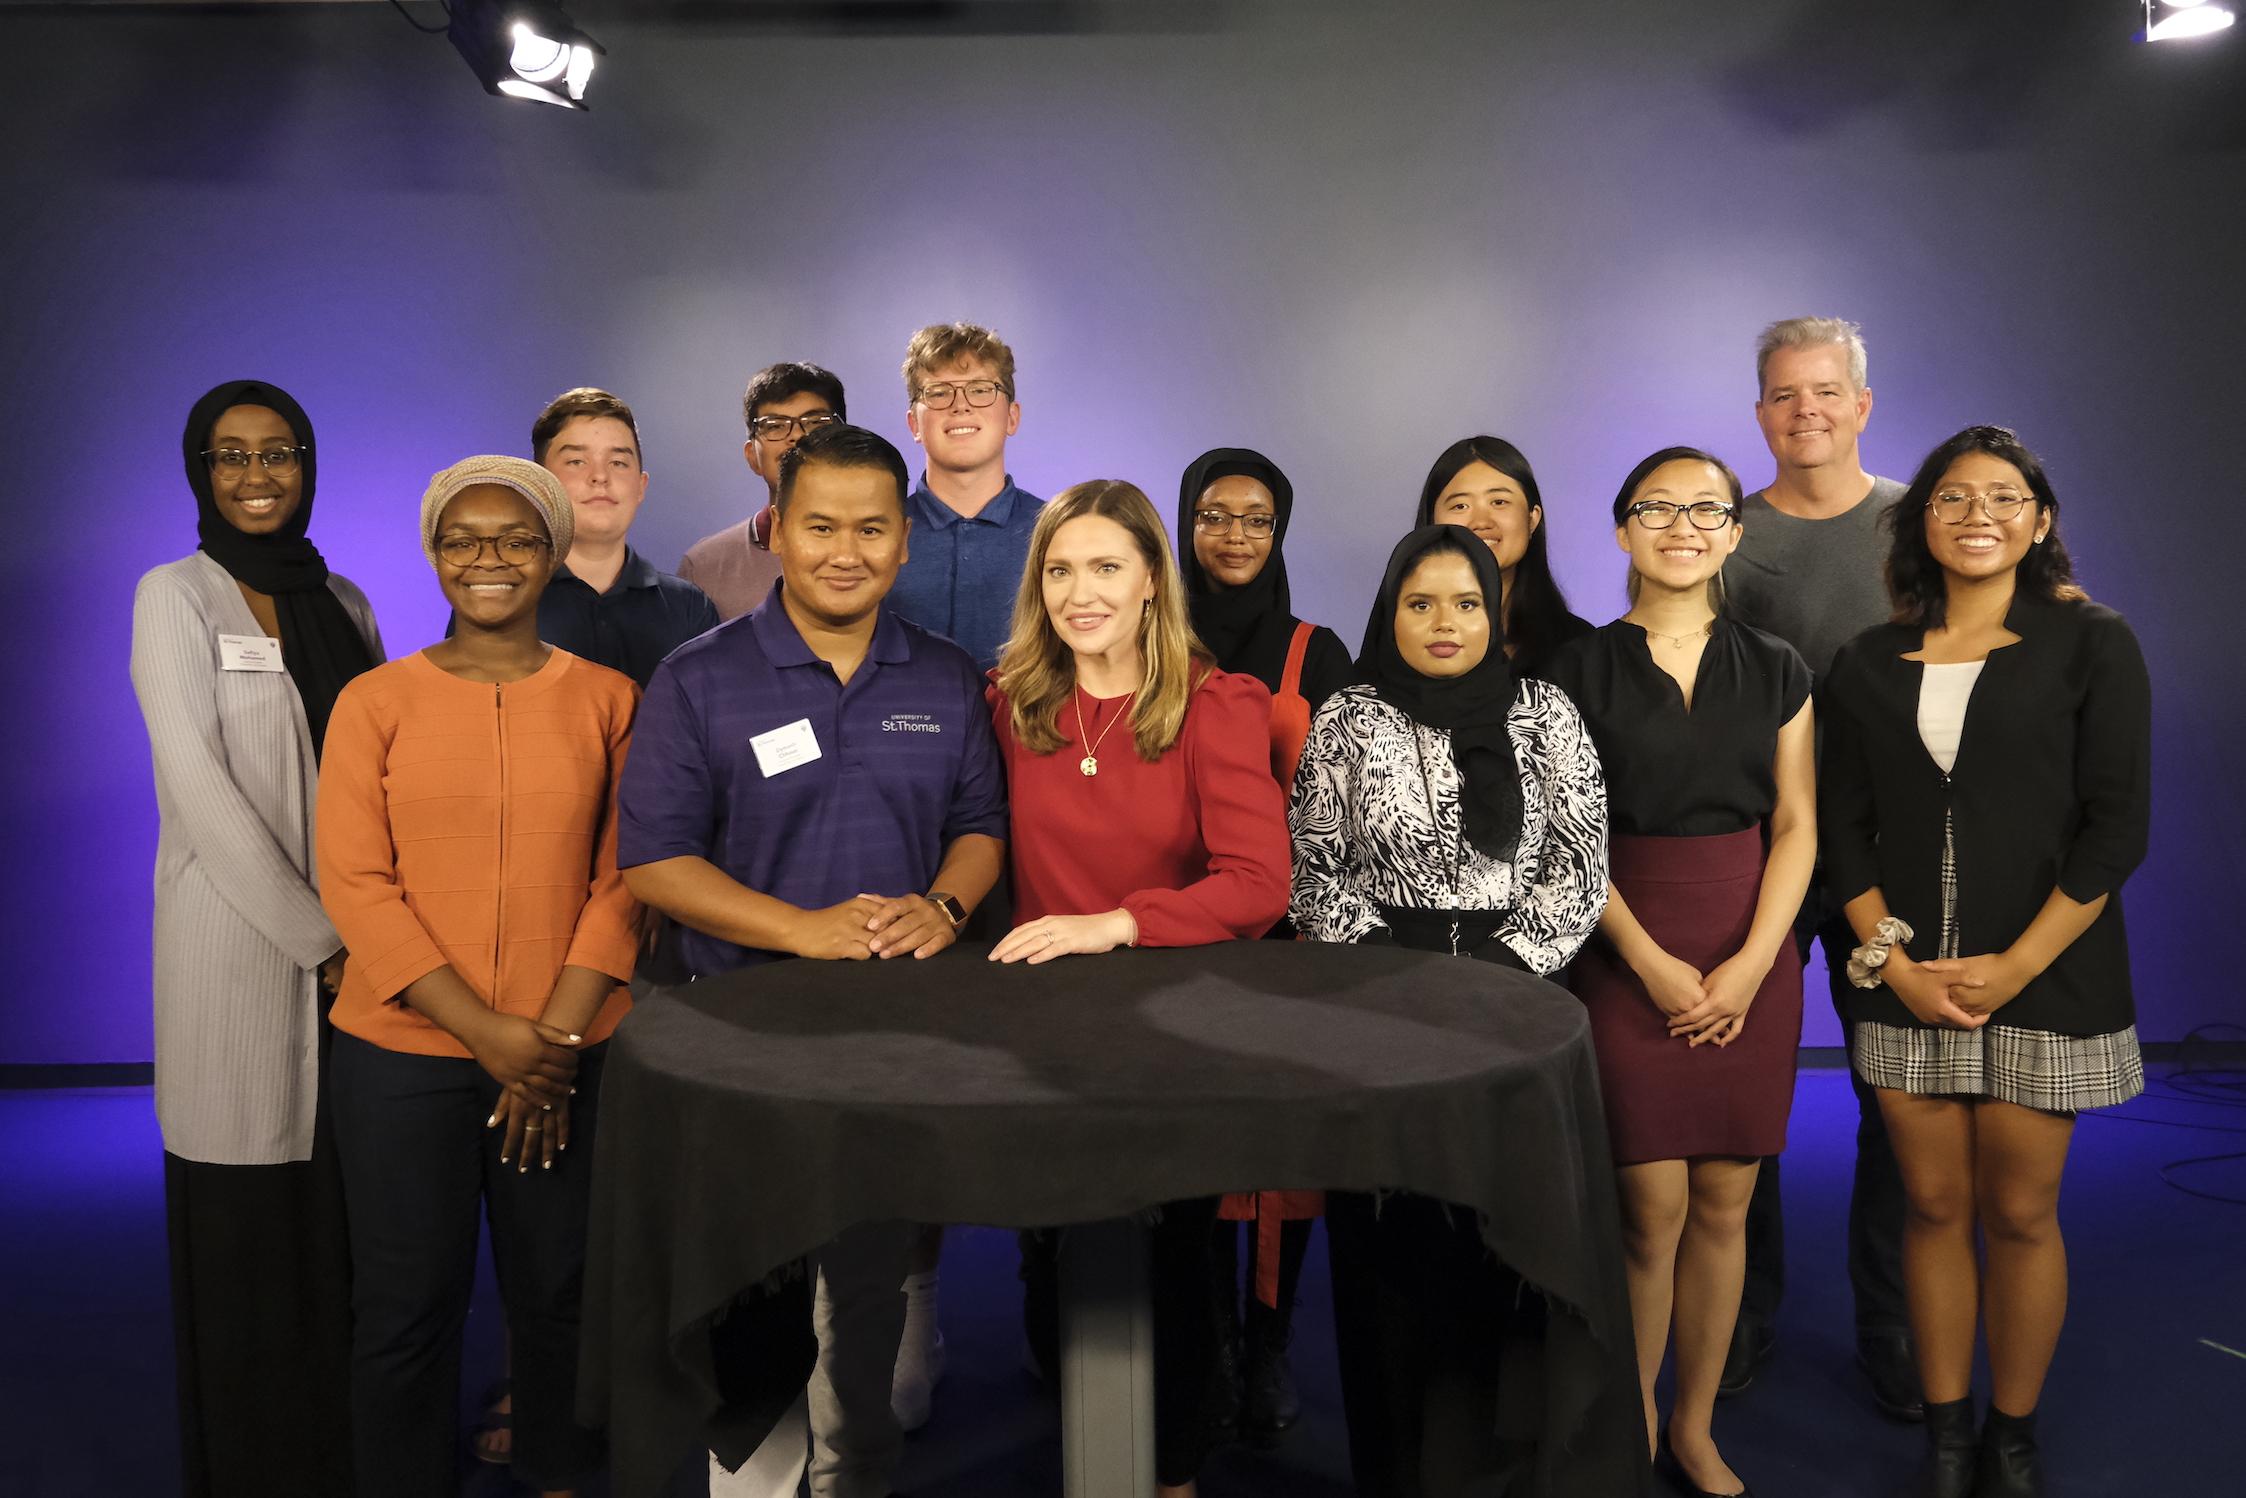 TV Camp studio group